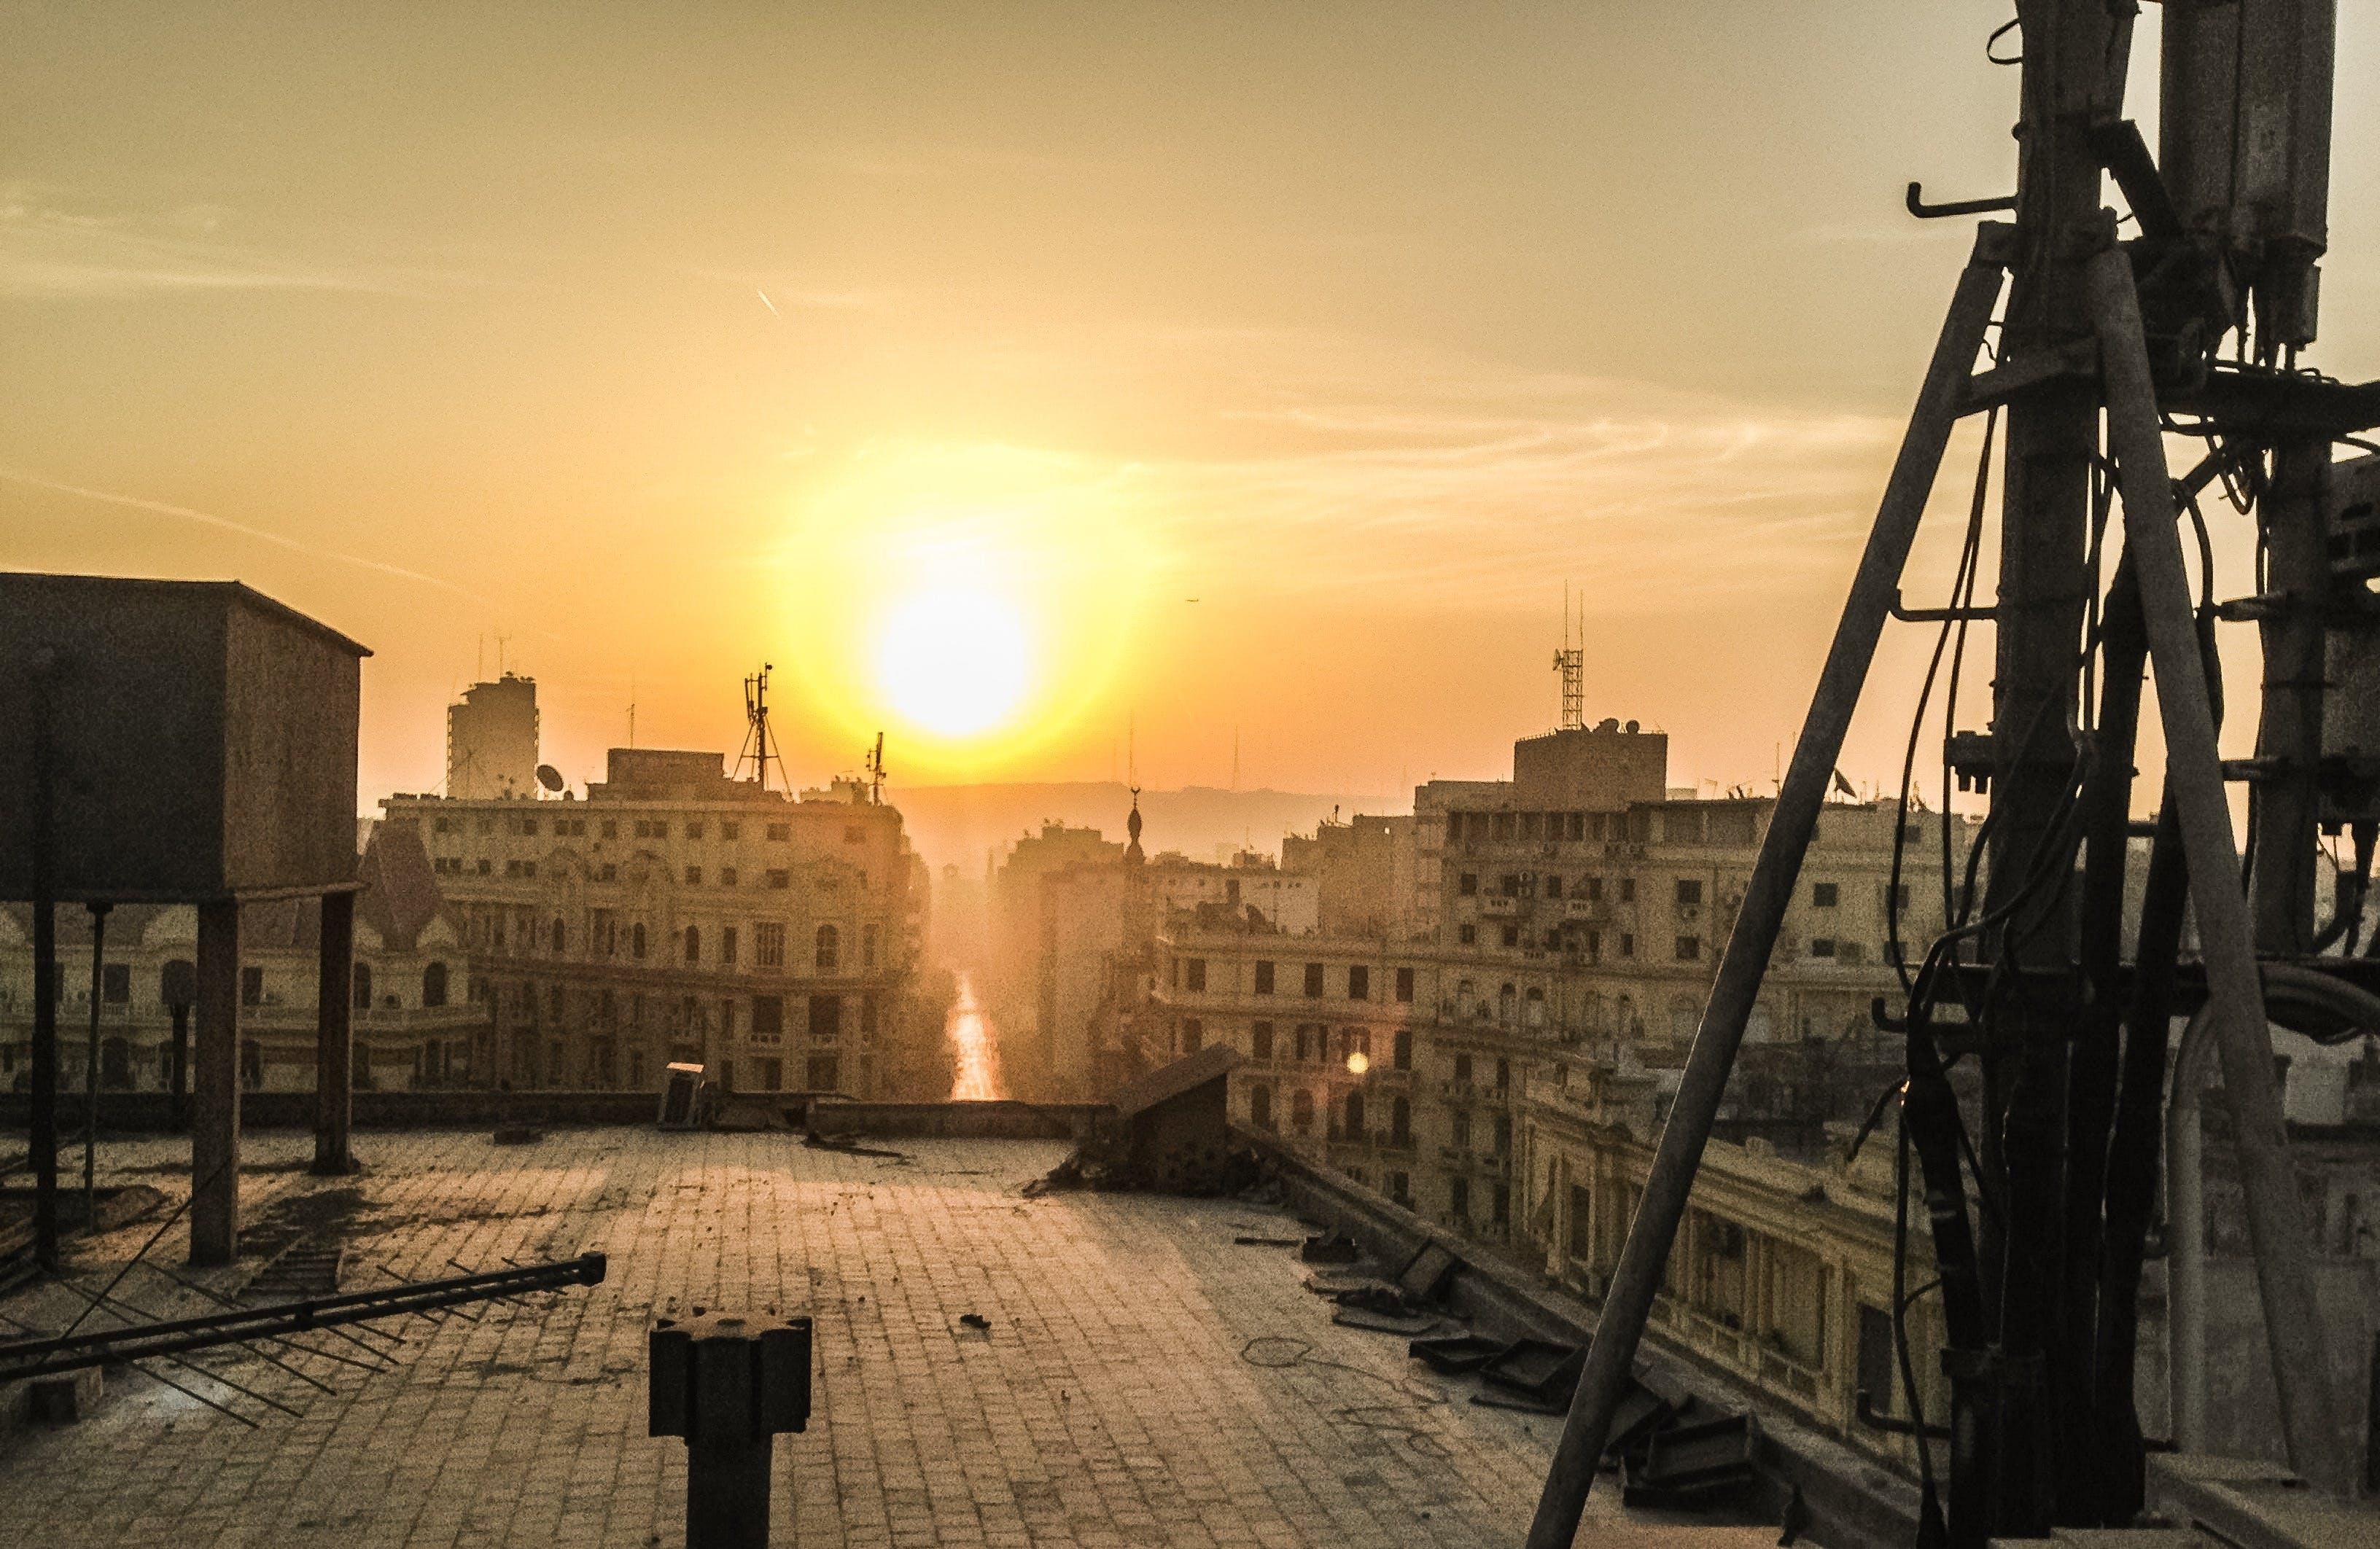 Free stock photo of buildings, sun, sunrise, capital